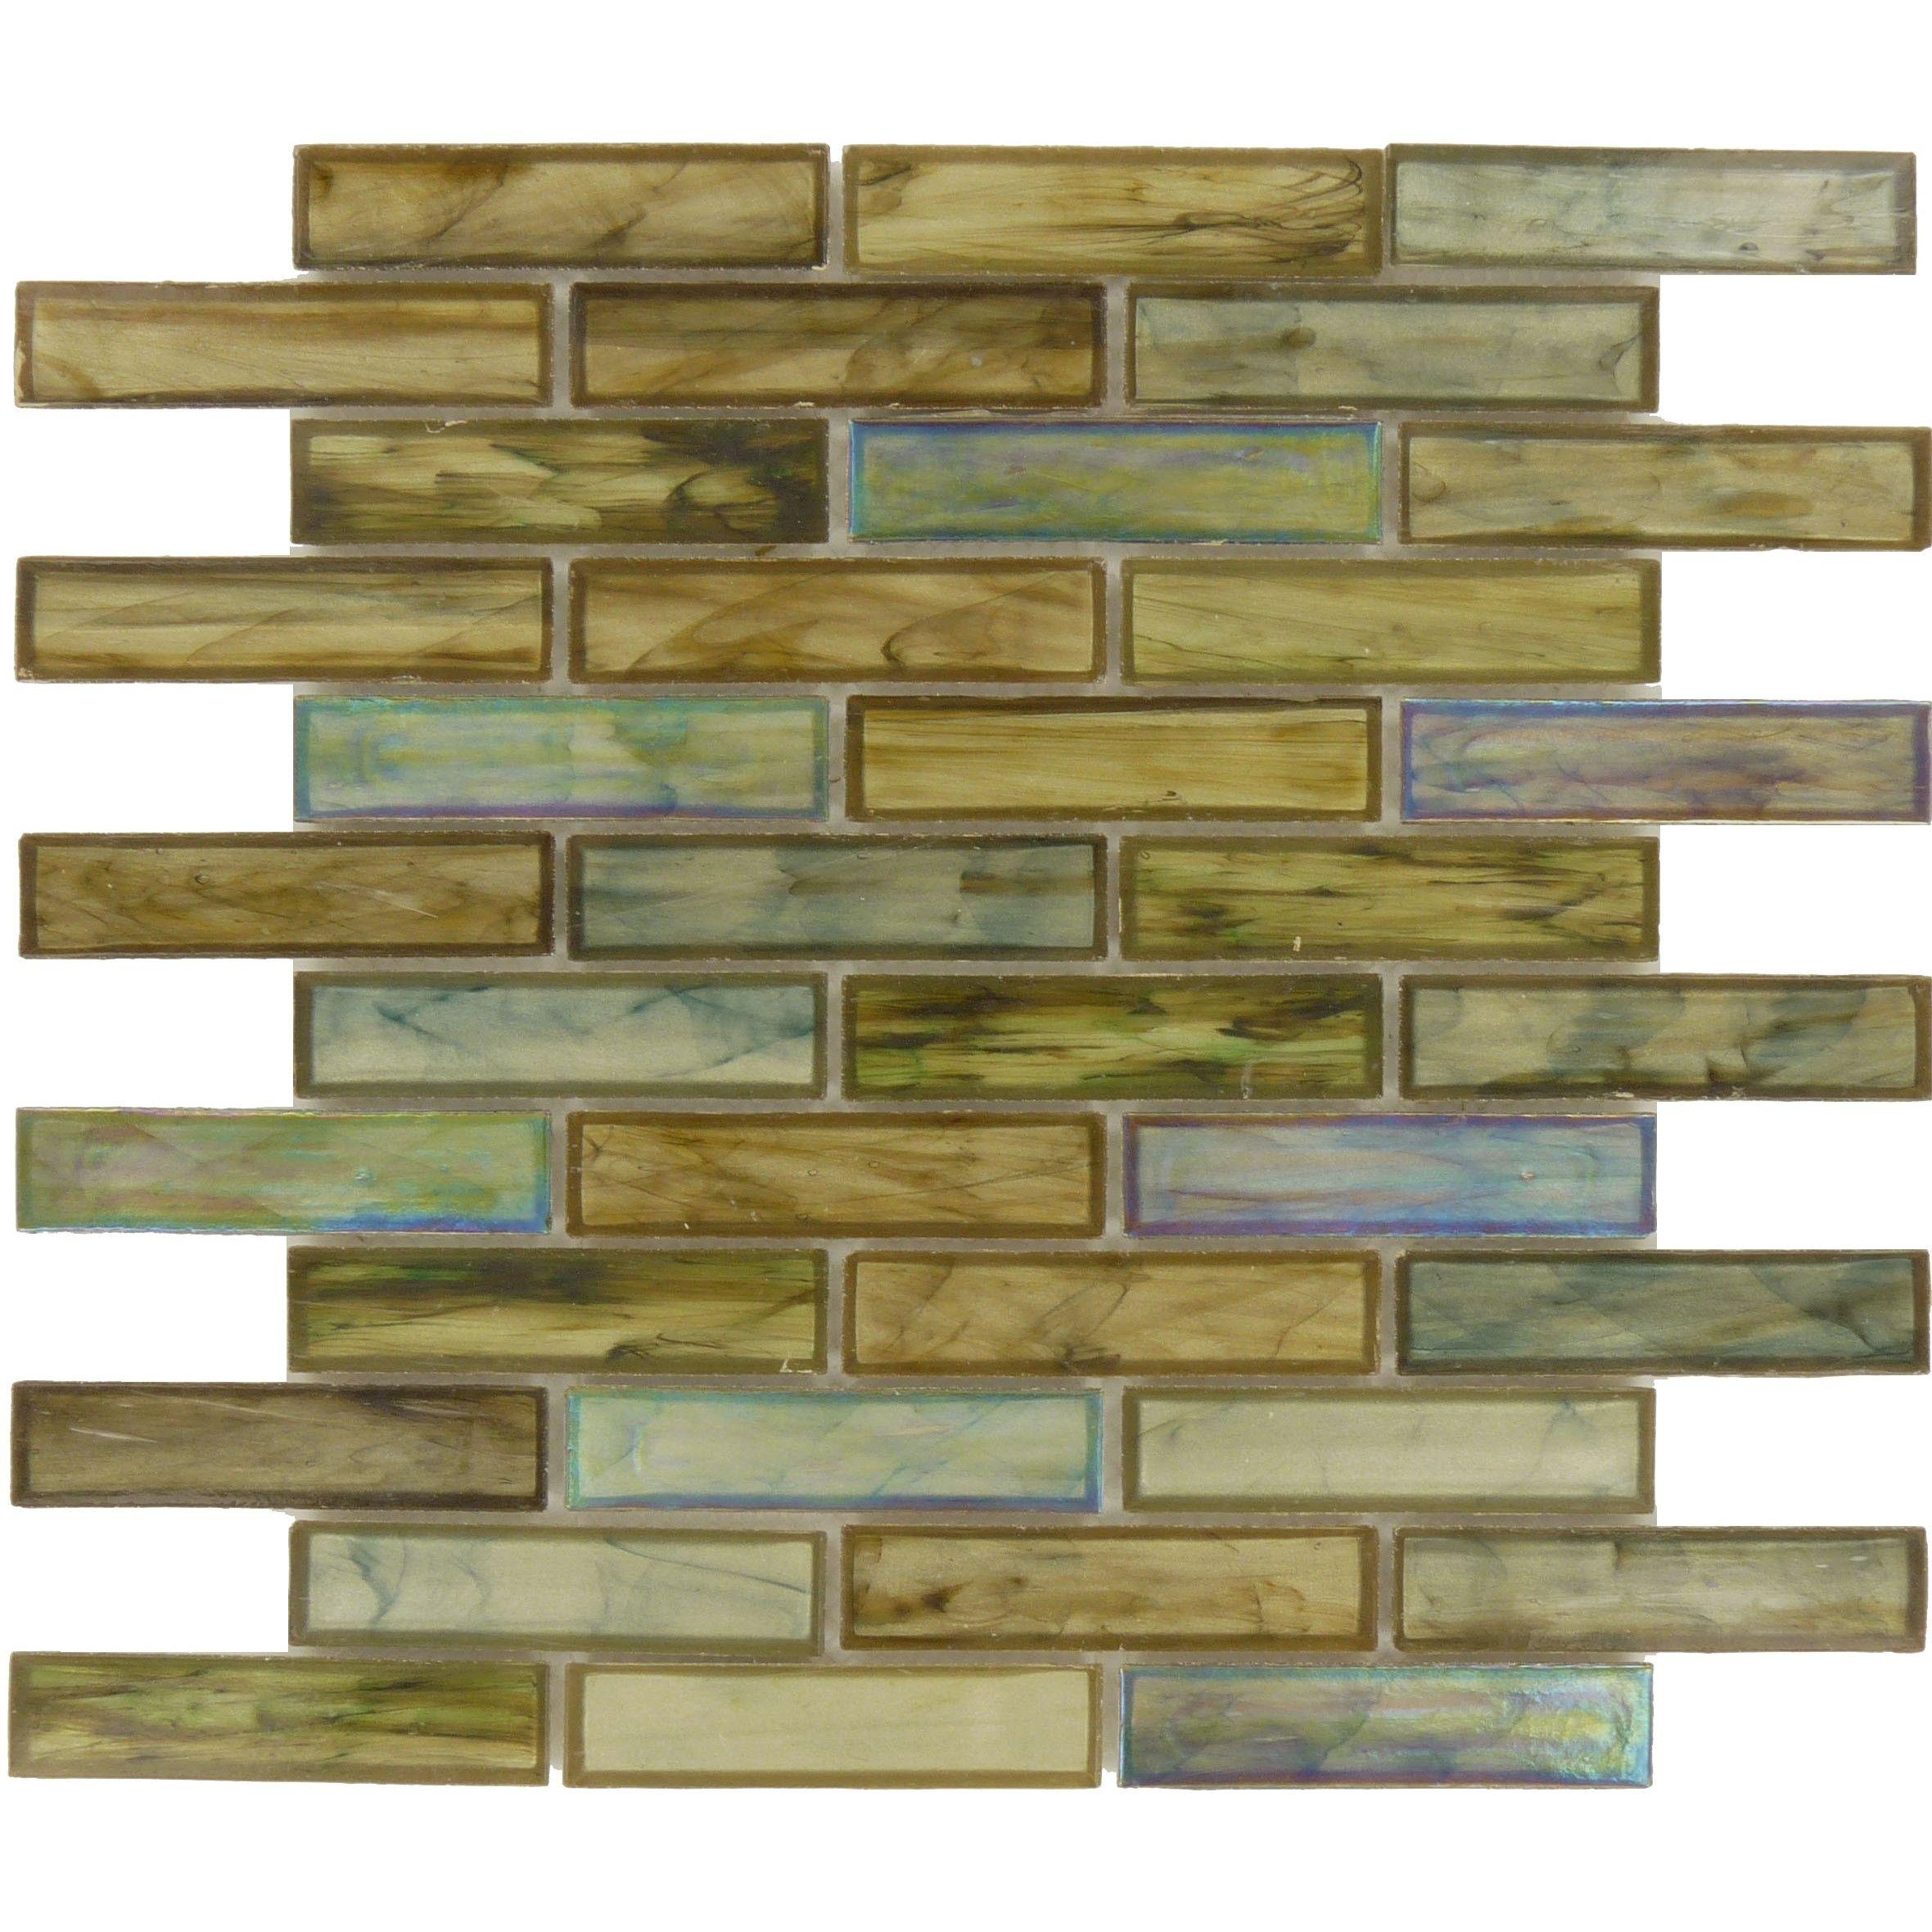 Tile Clear Glass Tiles Iridescent Tile X Glass Tile Kitchen - Clear glass tiles 4x4